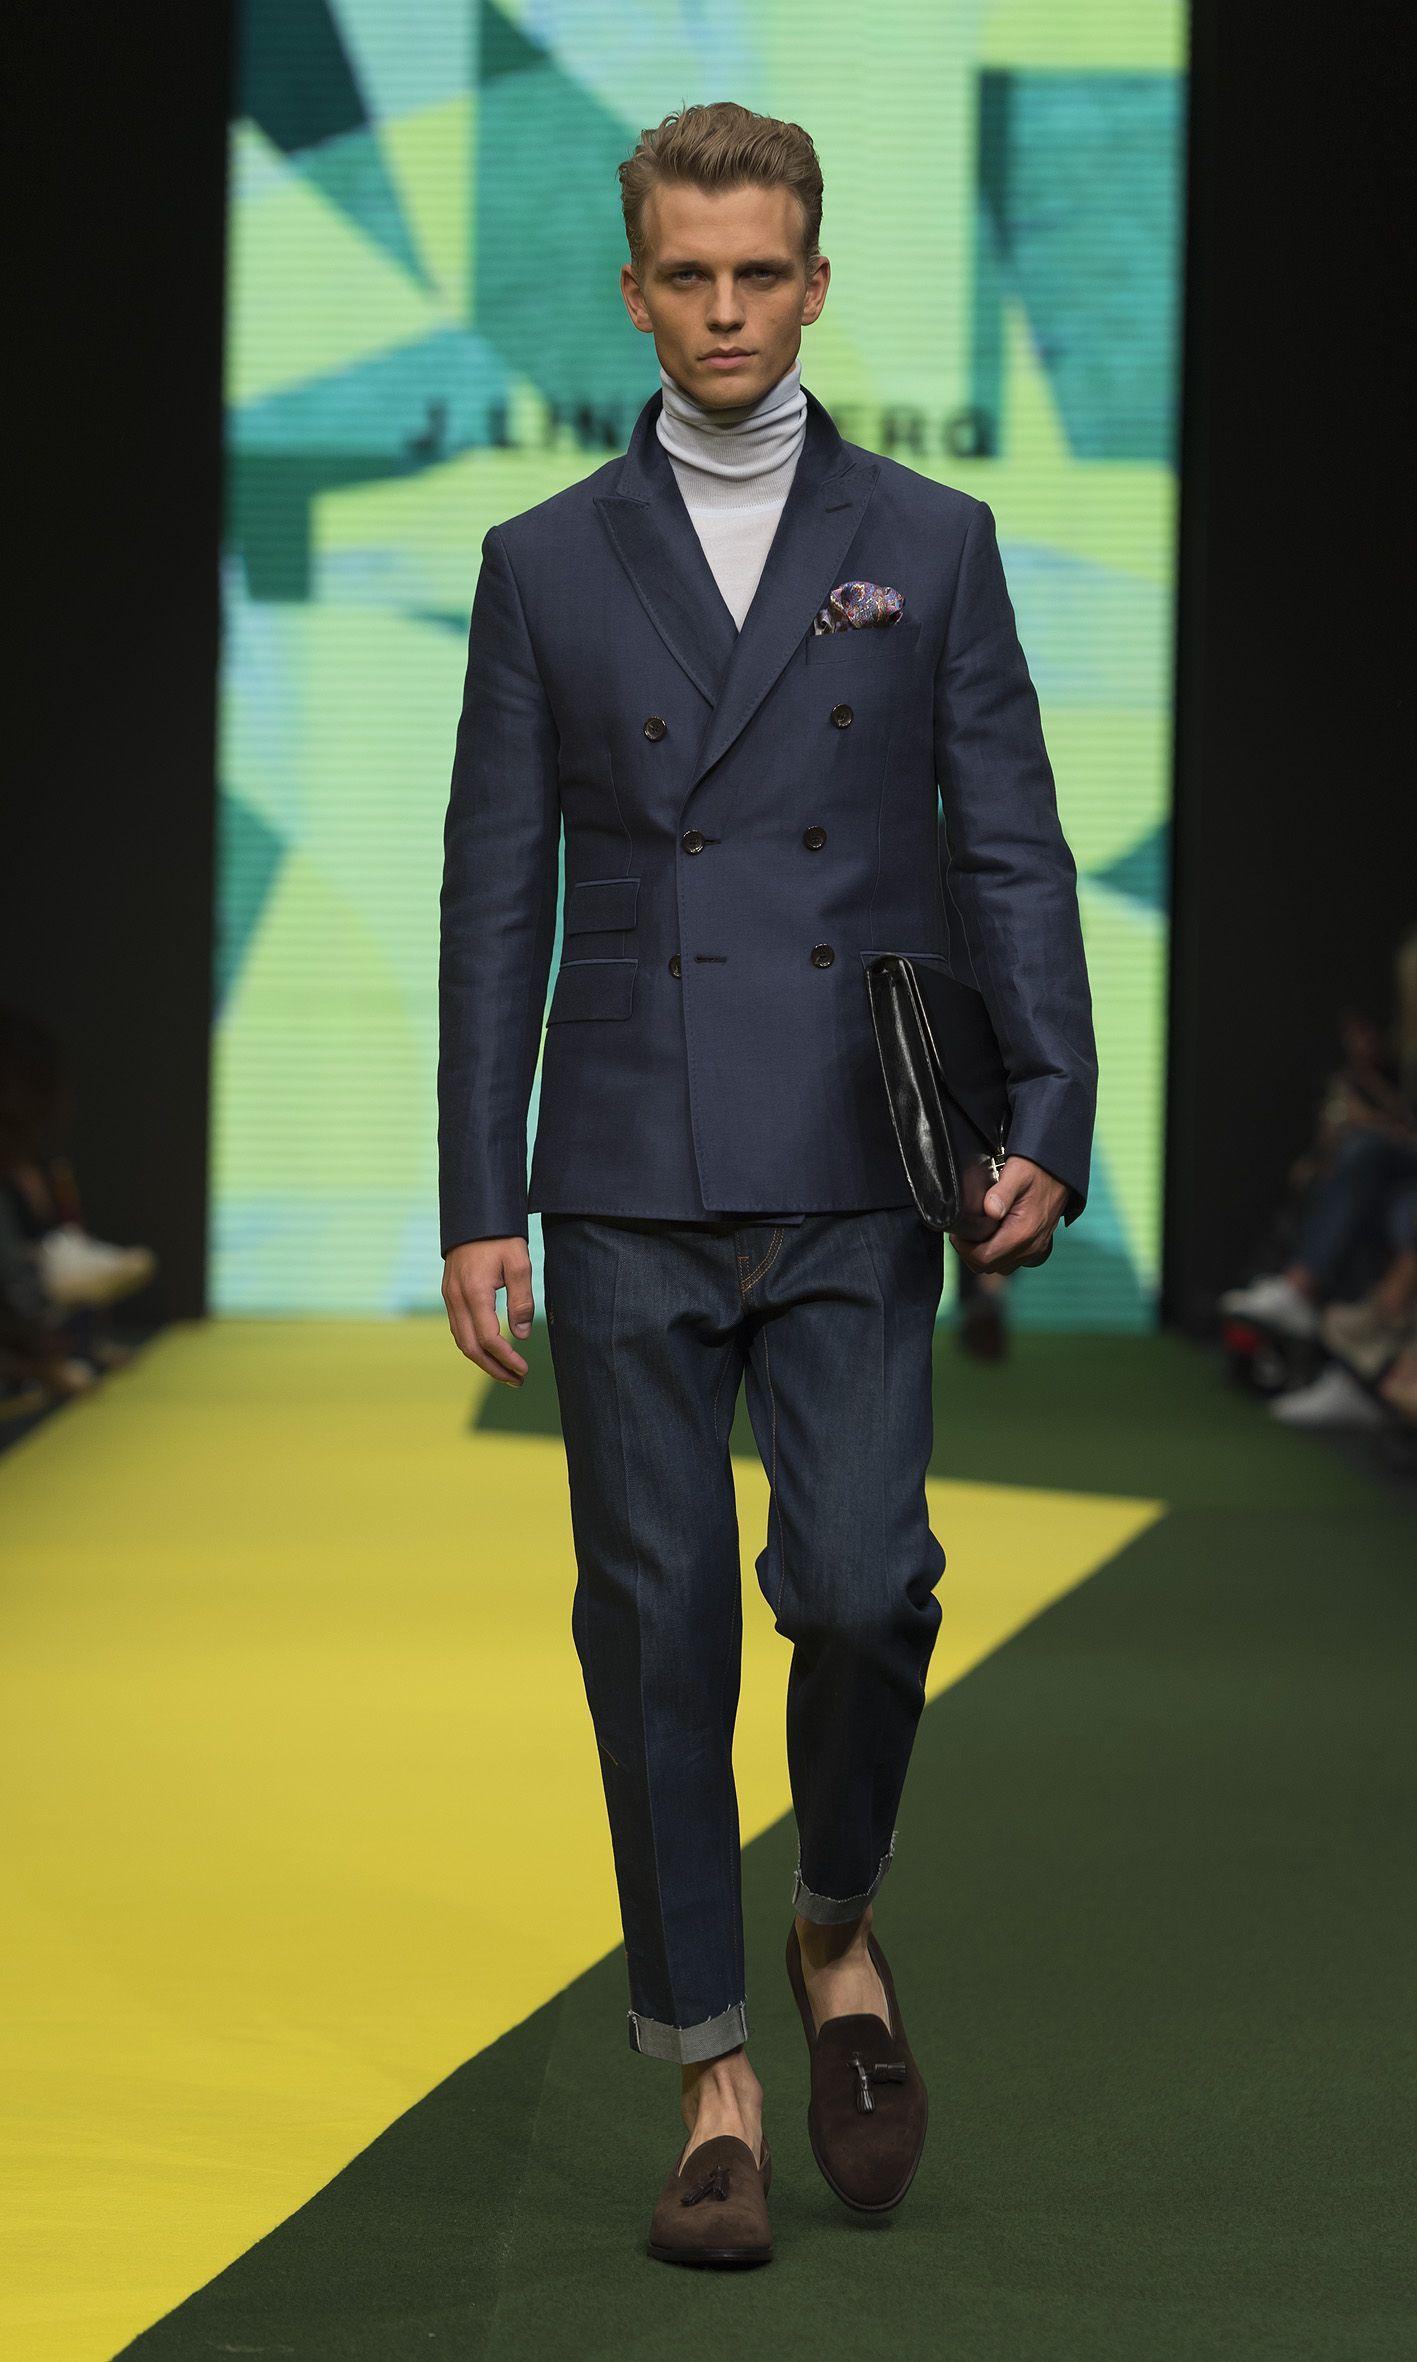 Barefoot Style Blazer Elegance Footwear Guy Ivy